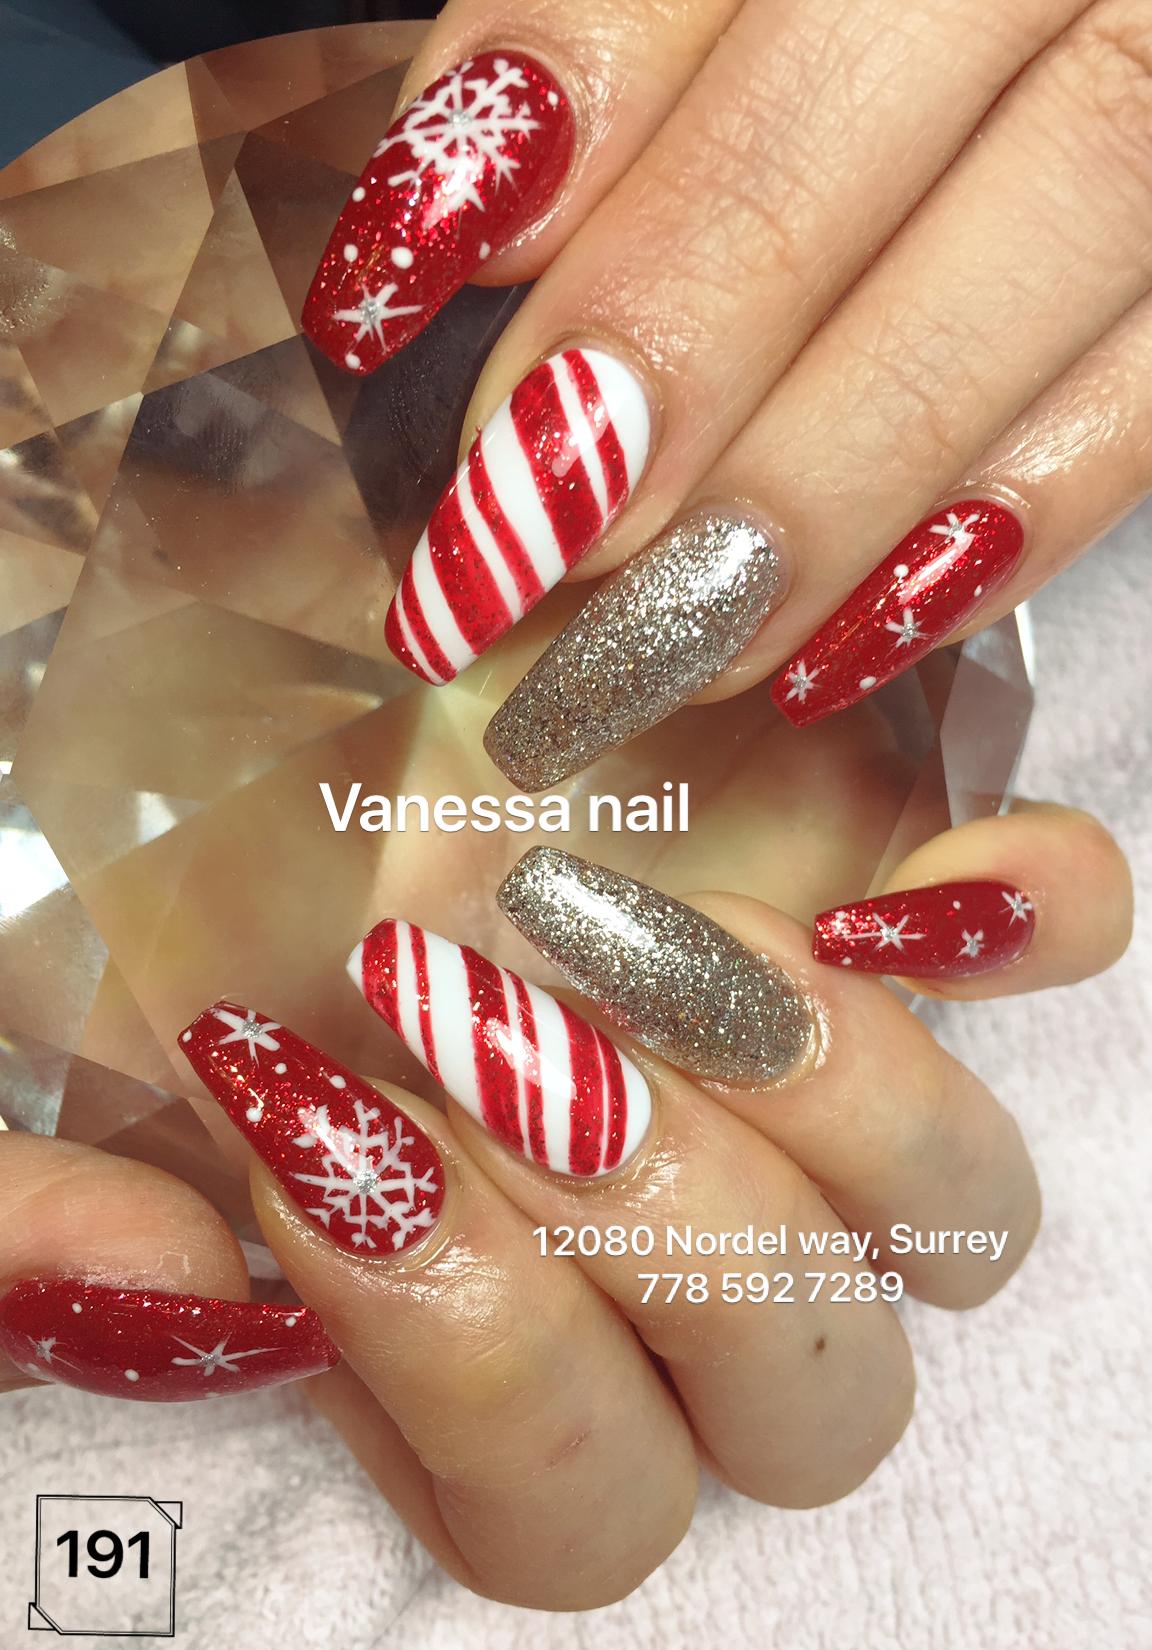 Vanessa Nail Spa Nail Salon Open In Surrey Near Me Surrey Bc Vanessa Nails Nail Spa Nail Services